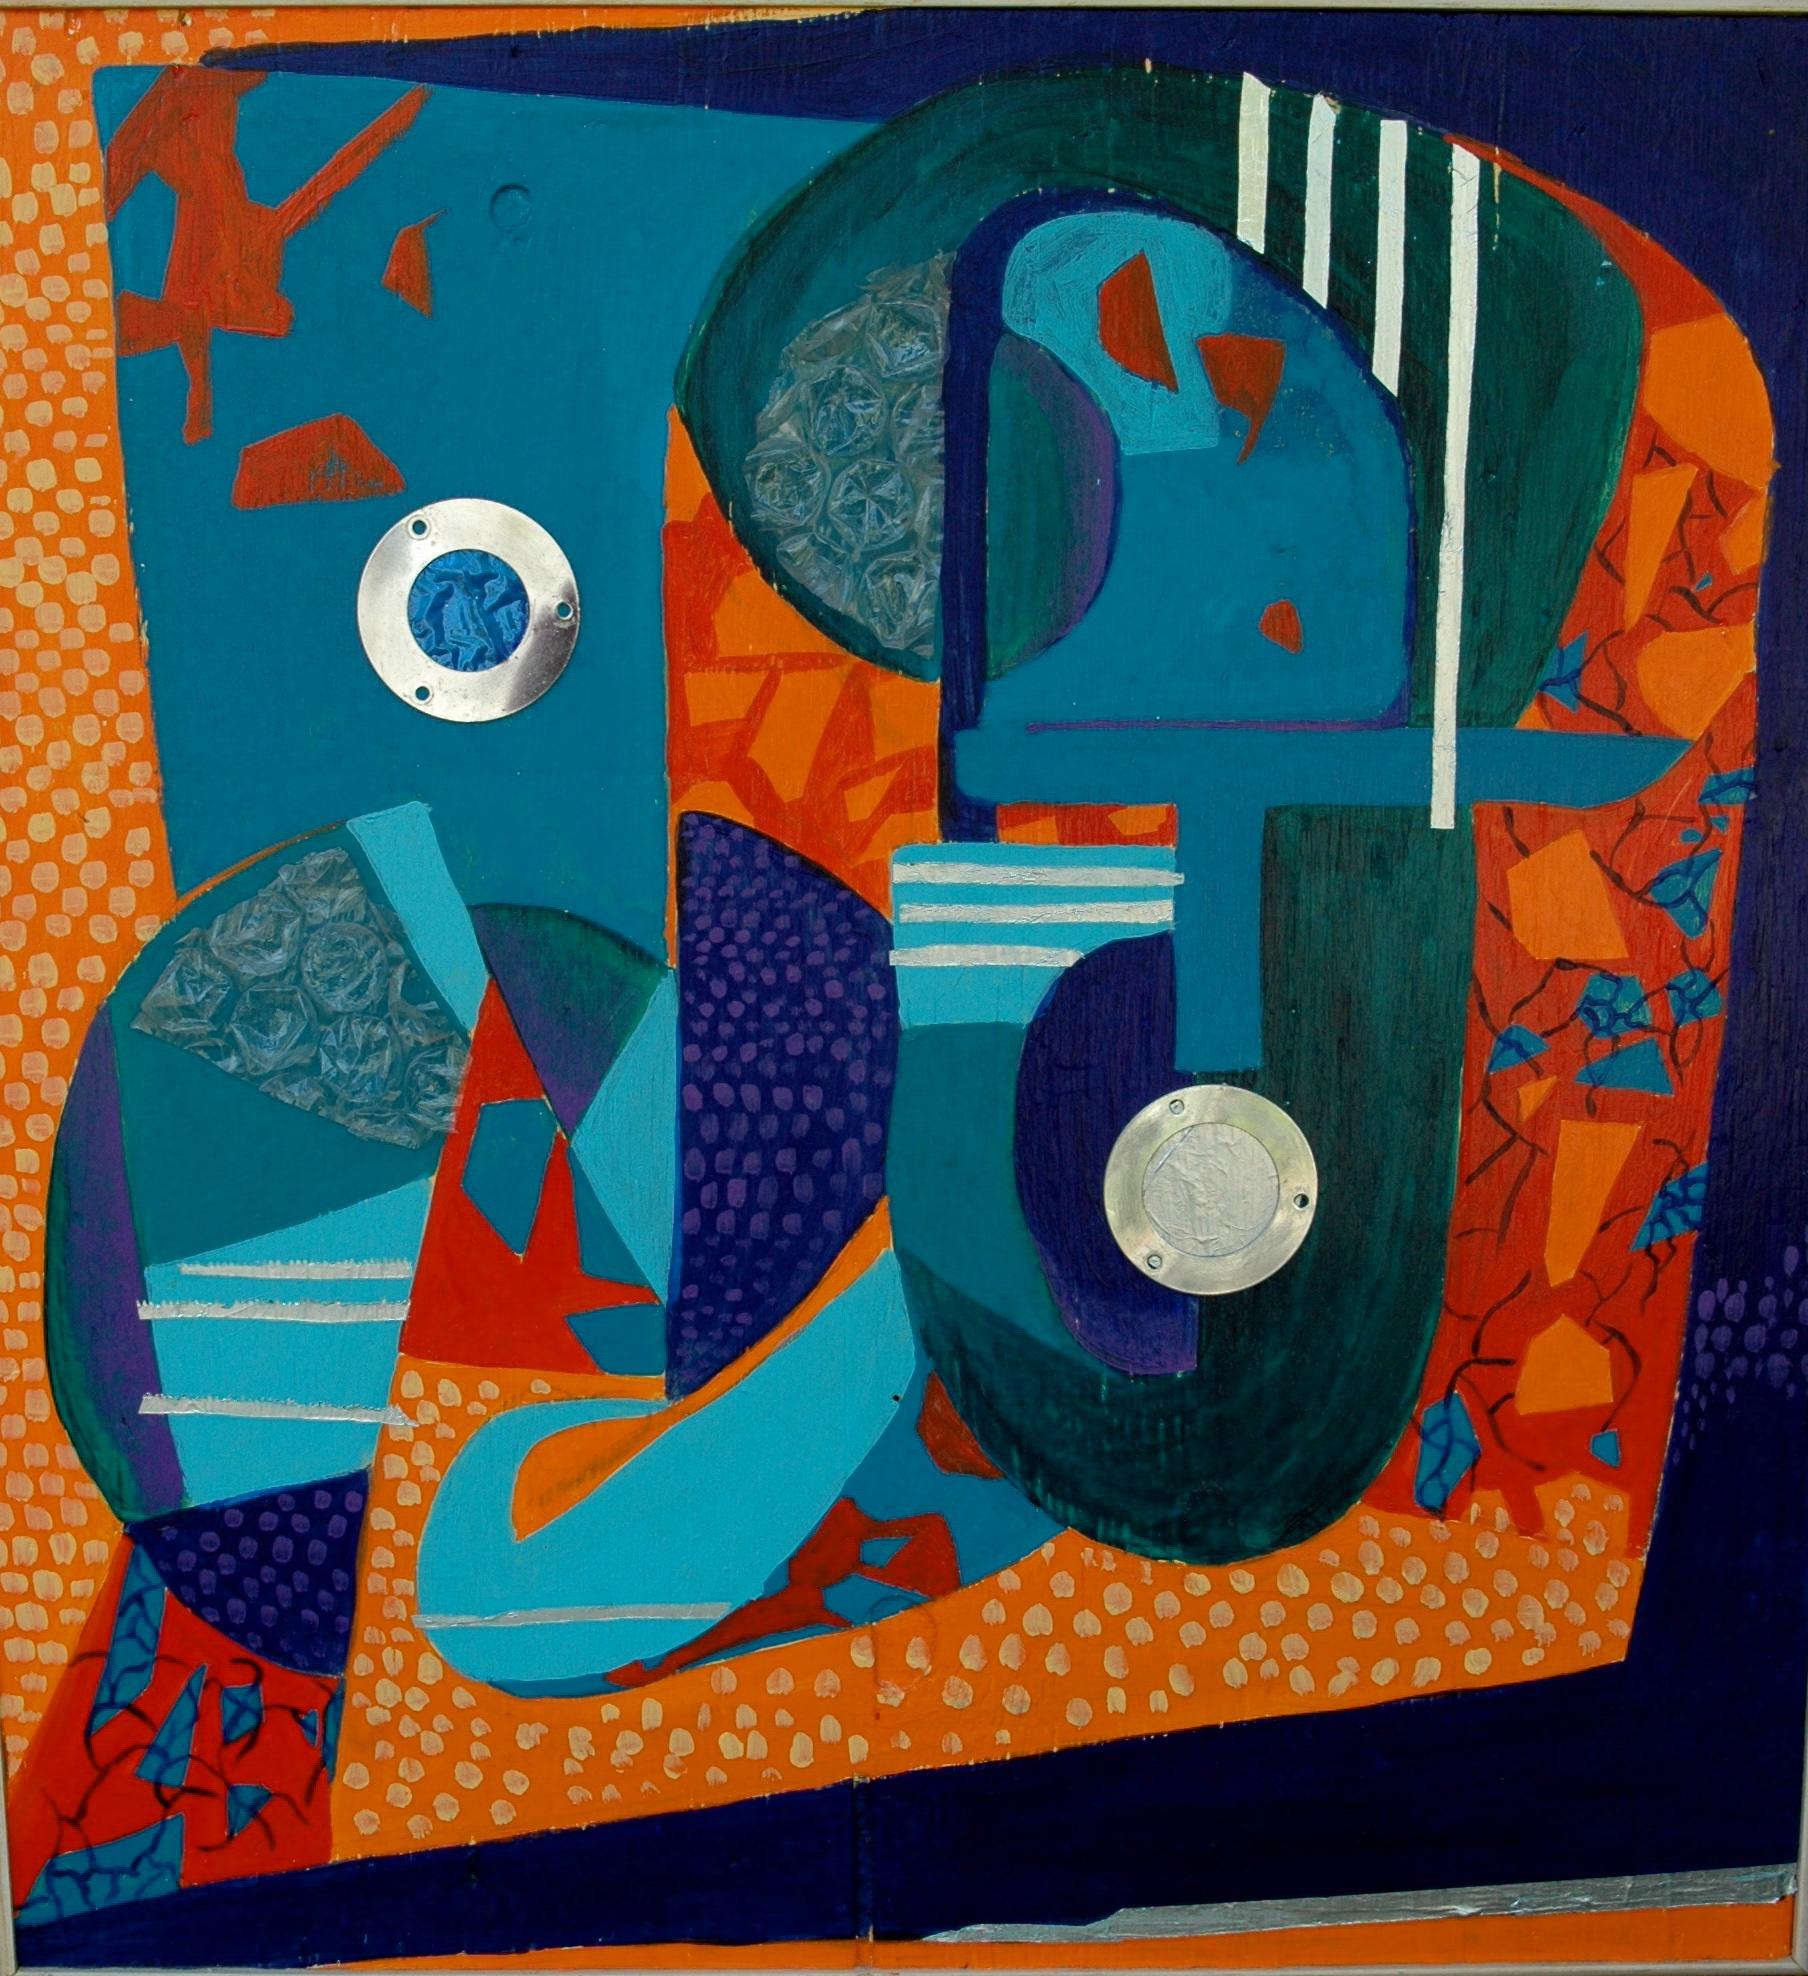 Phyllis Bluhm   Home Studio- 55 Kittredge St.